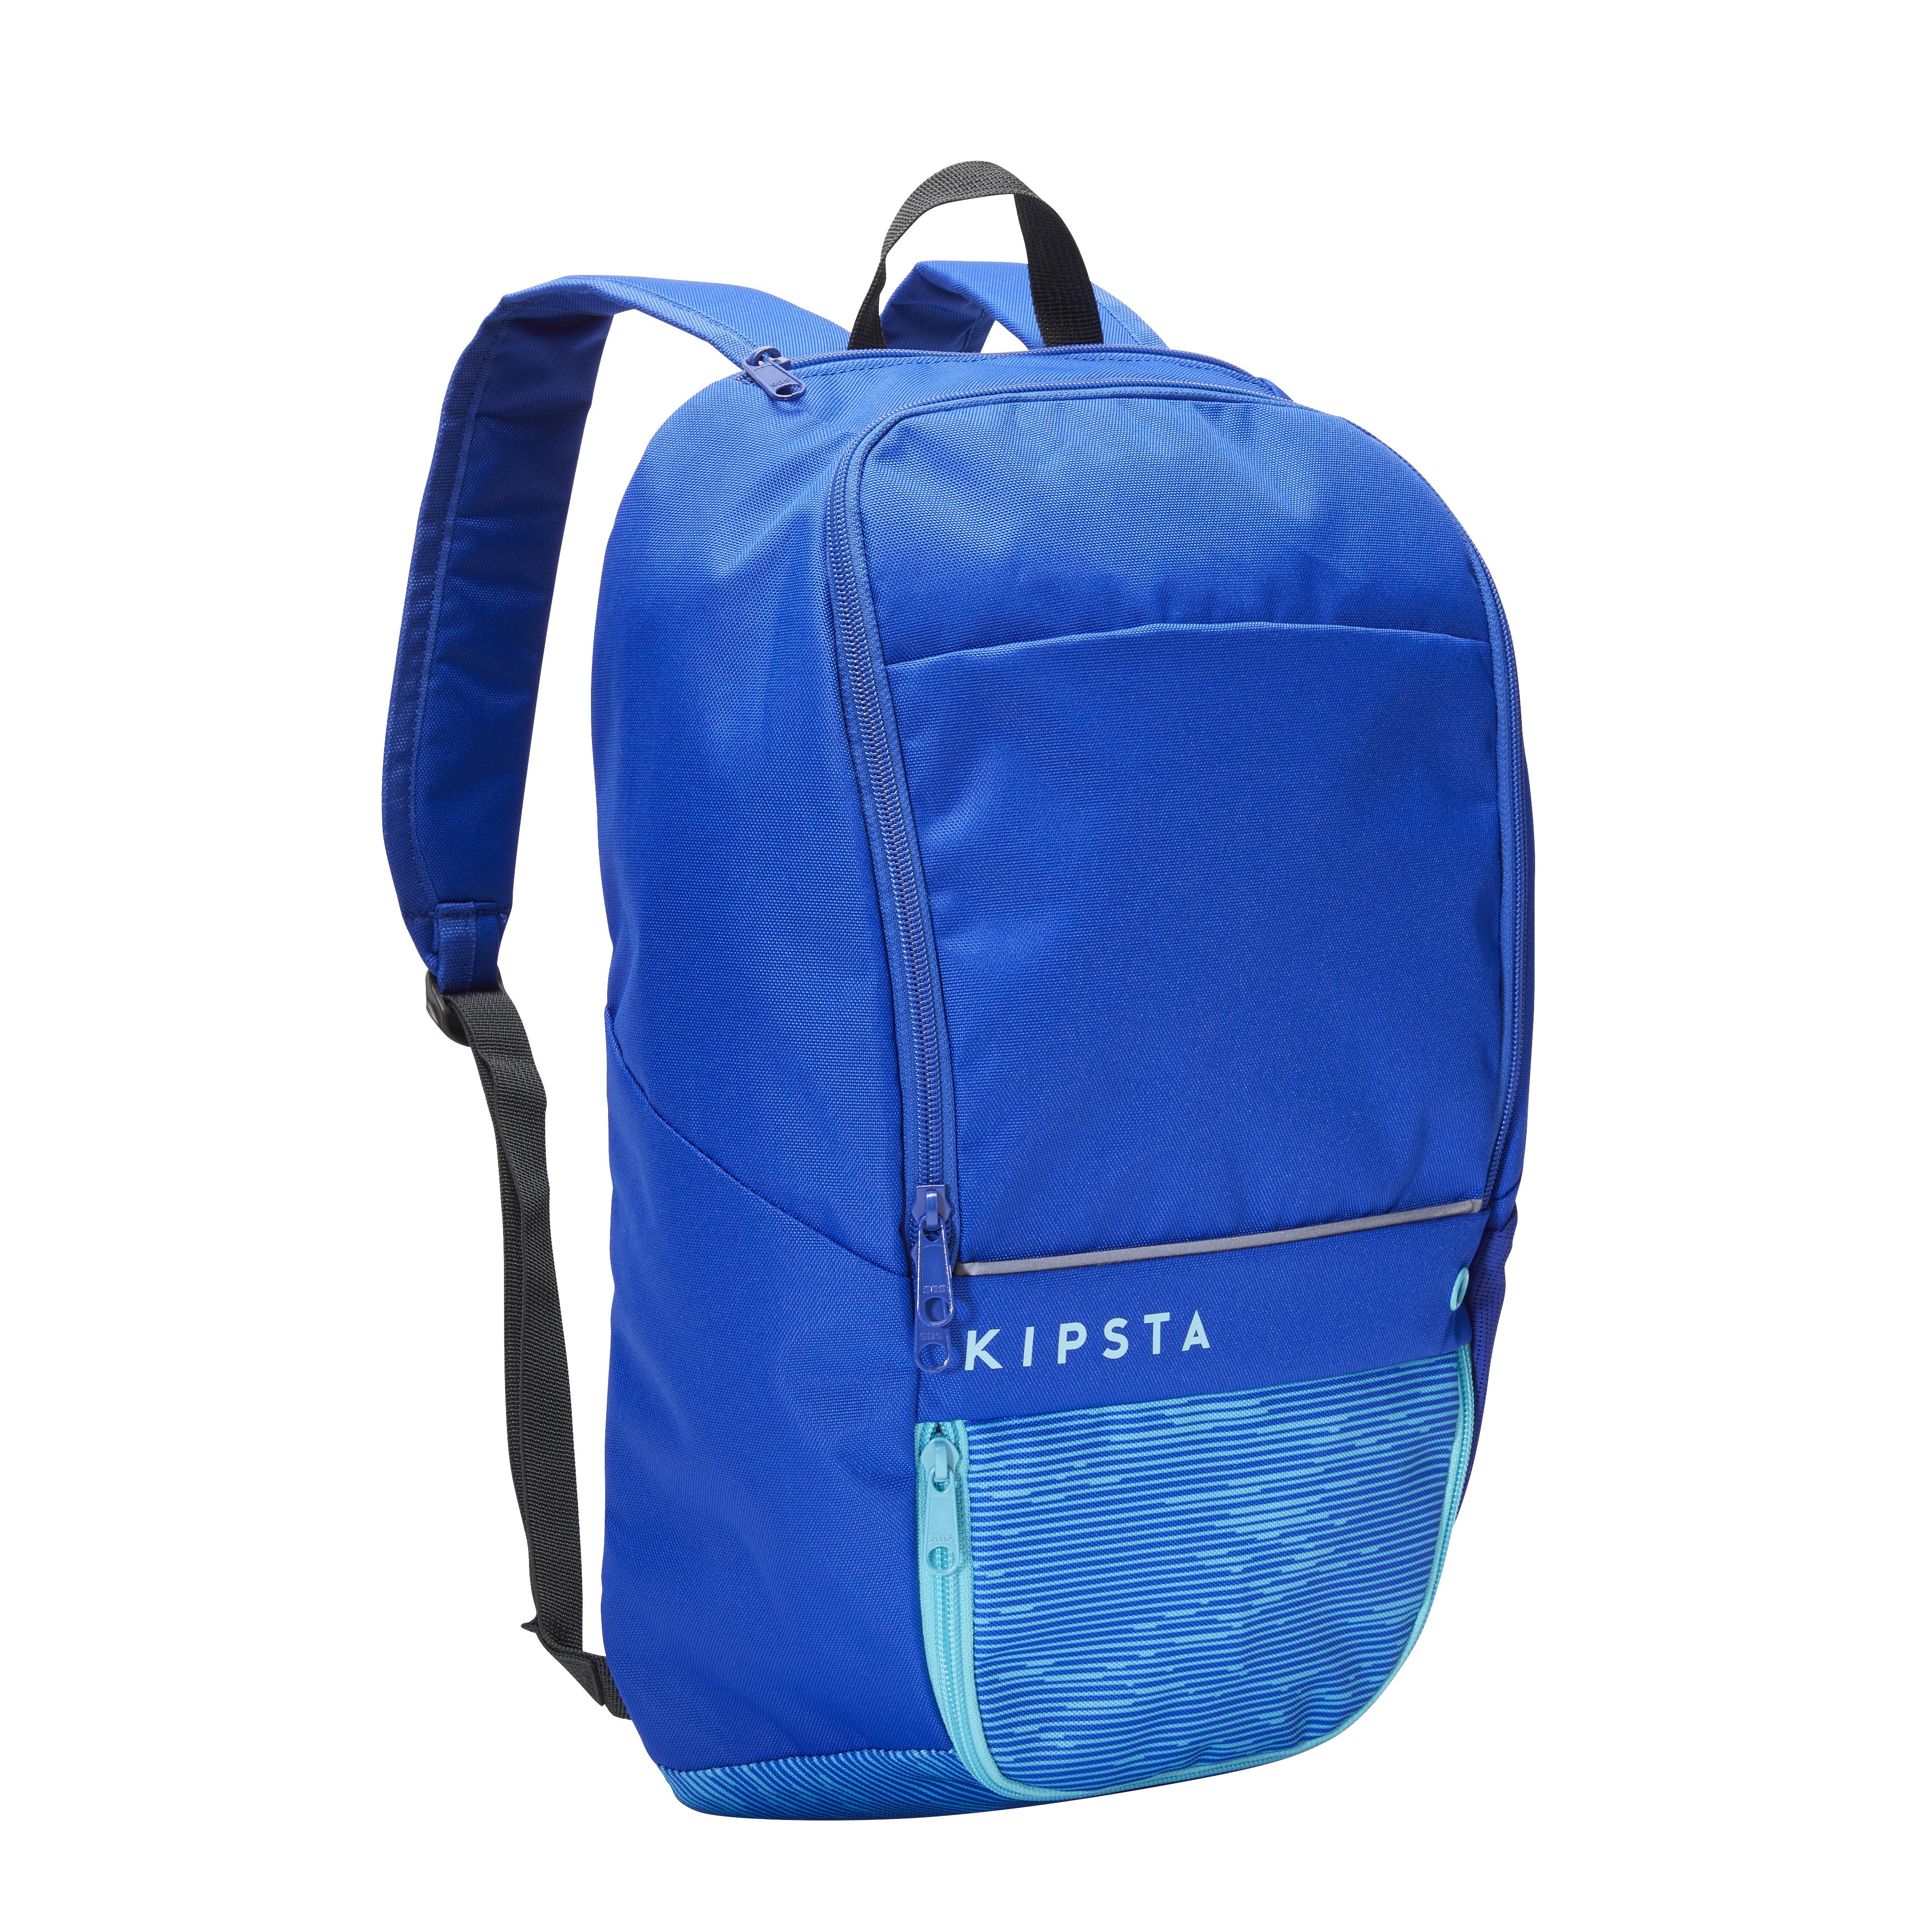 Kipsta Sac À Dos Essentiel 17l Bleu - 001 --- Expires On 21-01-2030.jpg